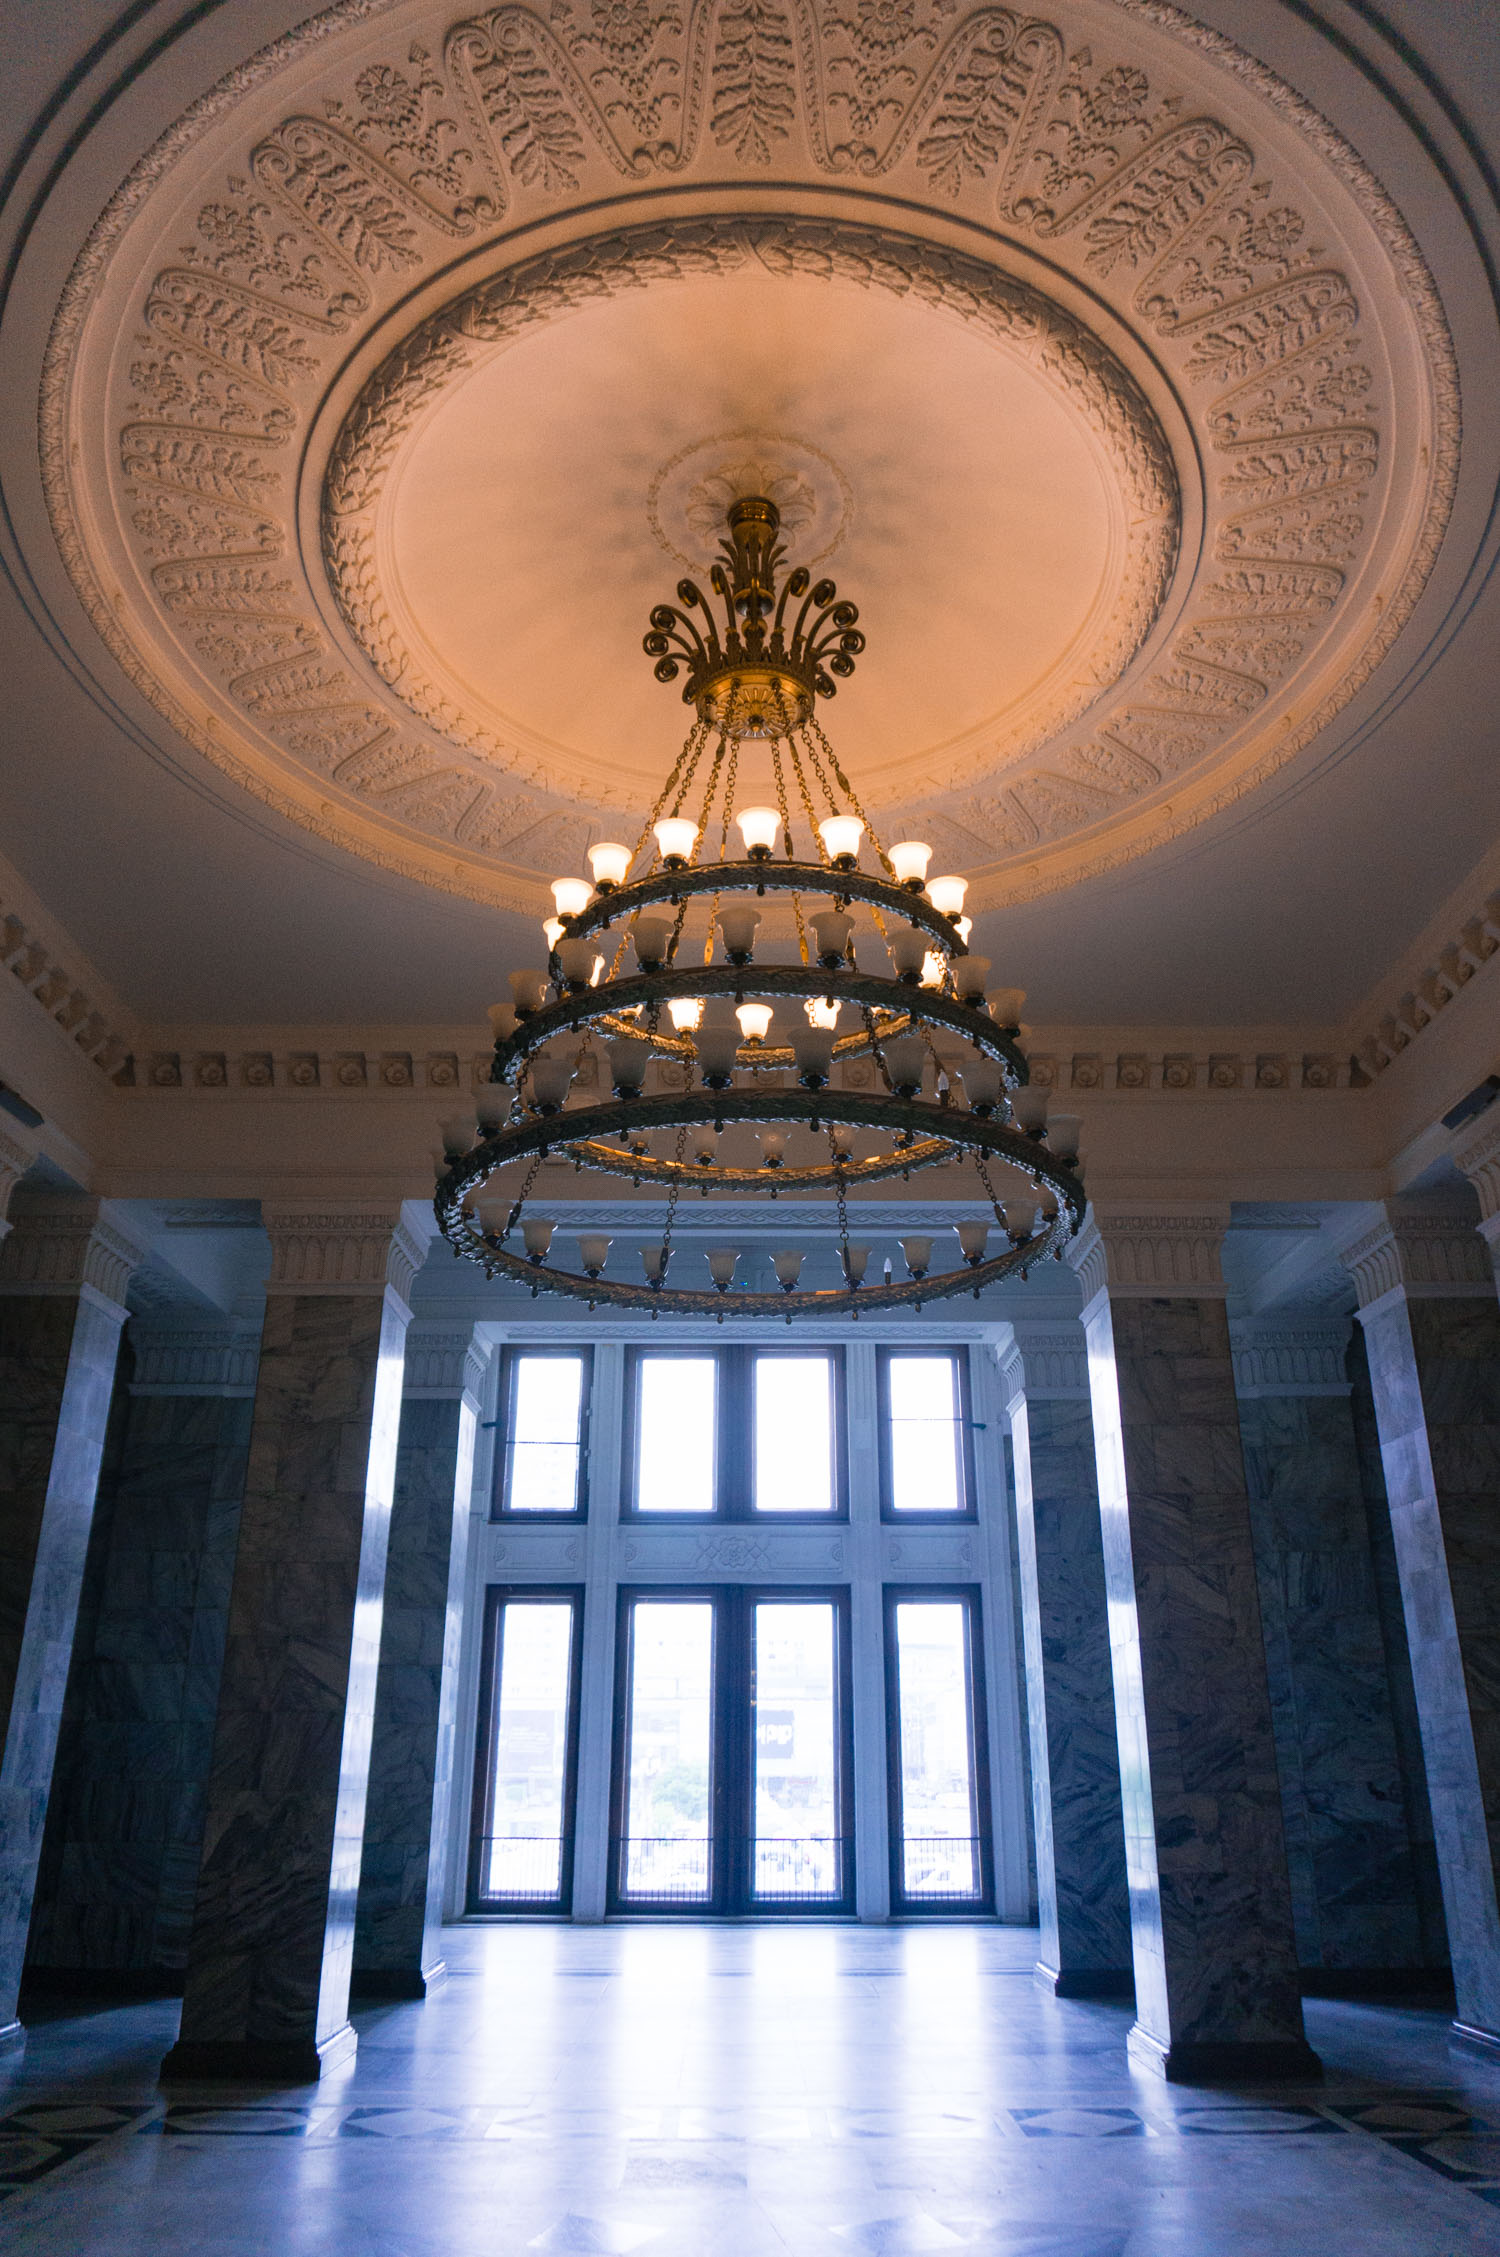 Besök kulturpalatset i Warszawa